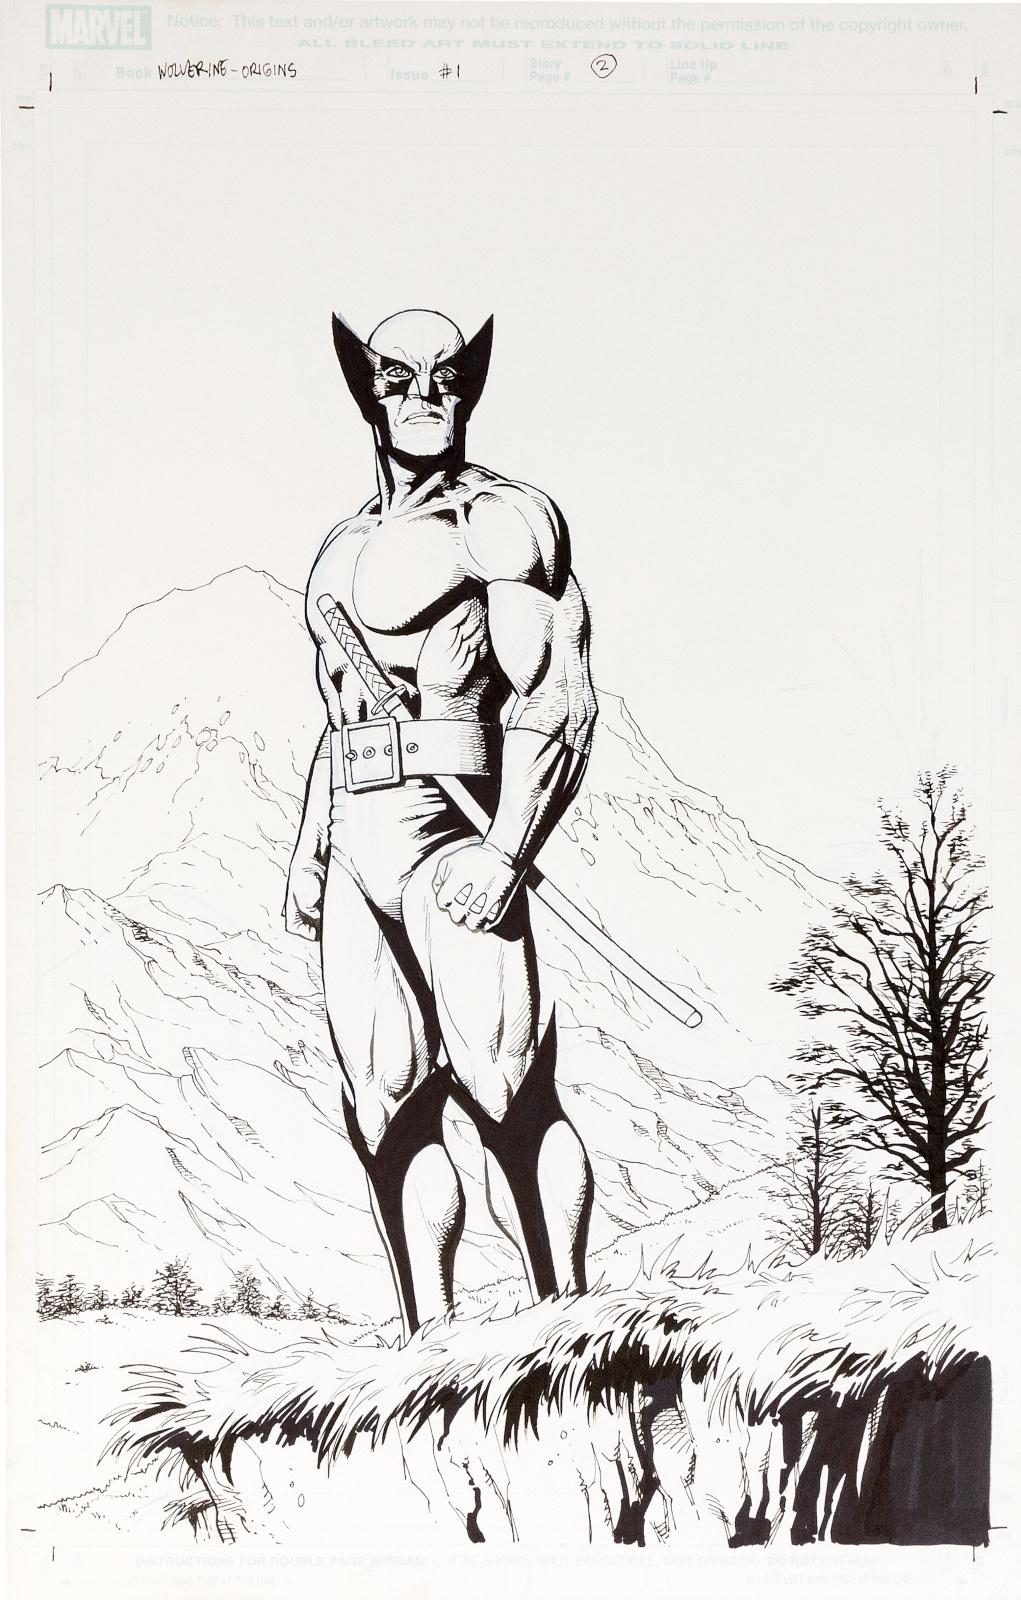 Wolverine Origins issue 1 splash by Steve Dillon